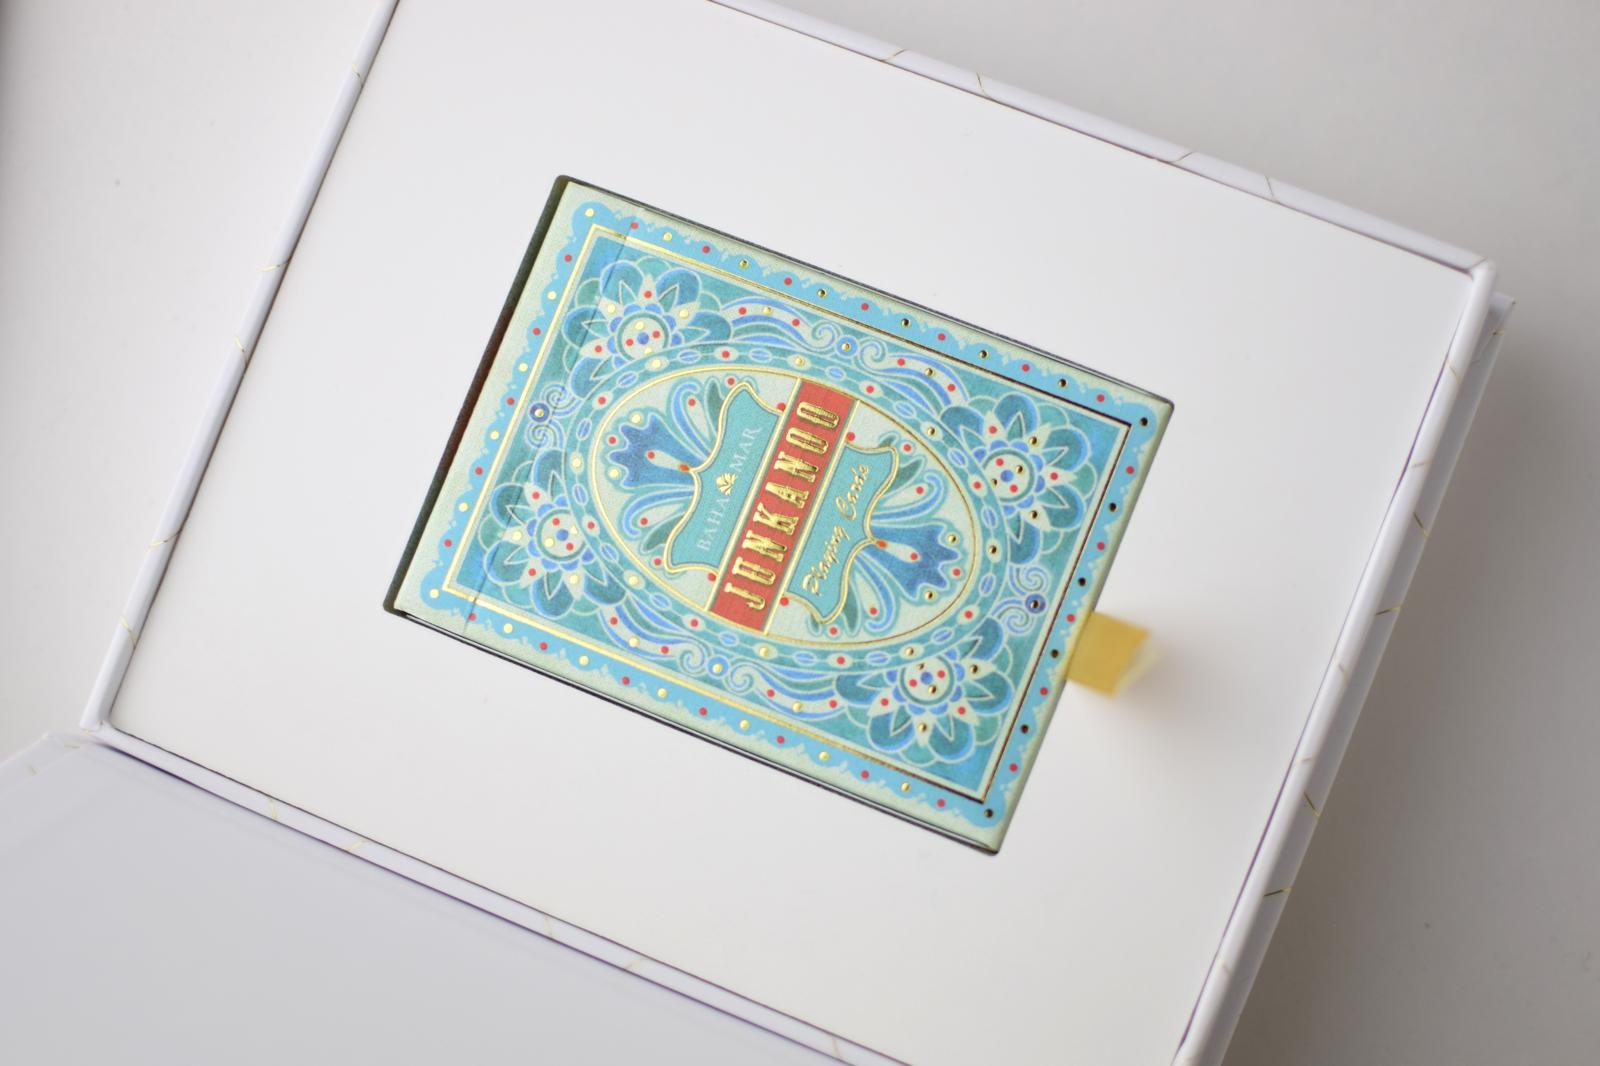 Rare Junkanoo Playing Cards by Uusi Limited Baha Mar Casino